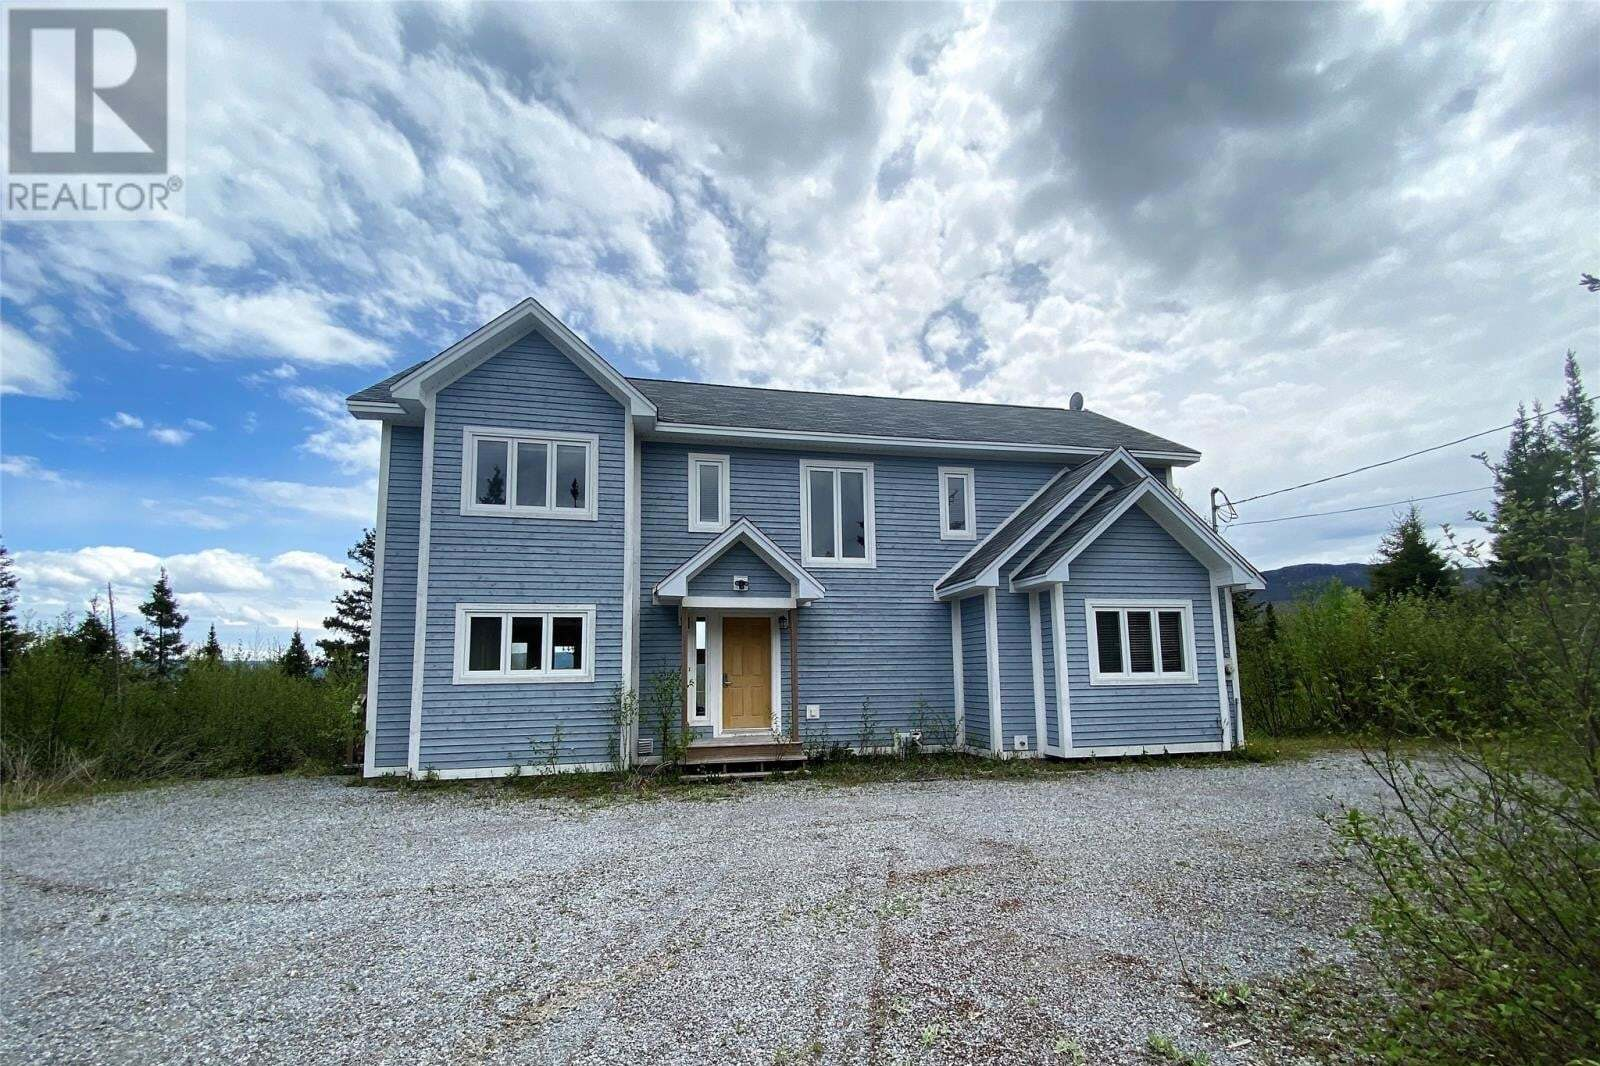 House for sale at 1 Juniper  Humber Valley Resort Newfoundland - MLS: 1214619